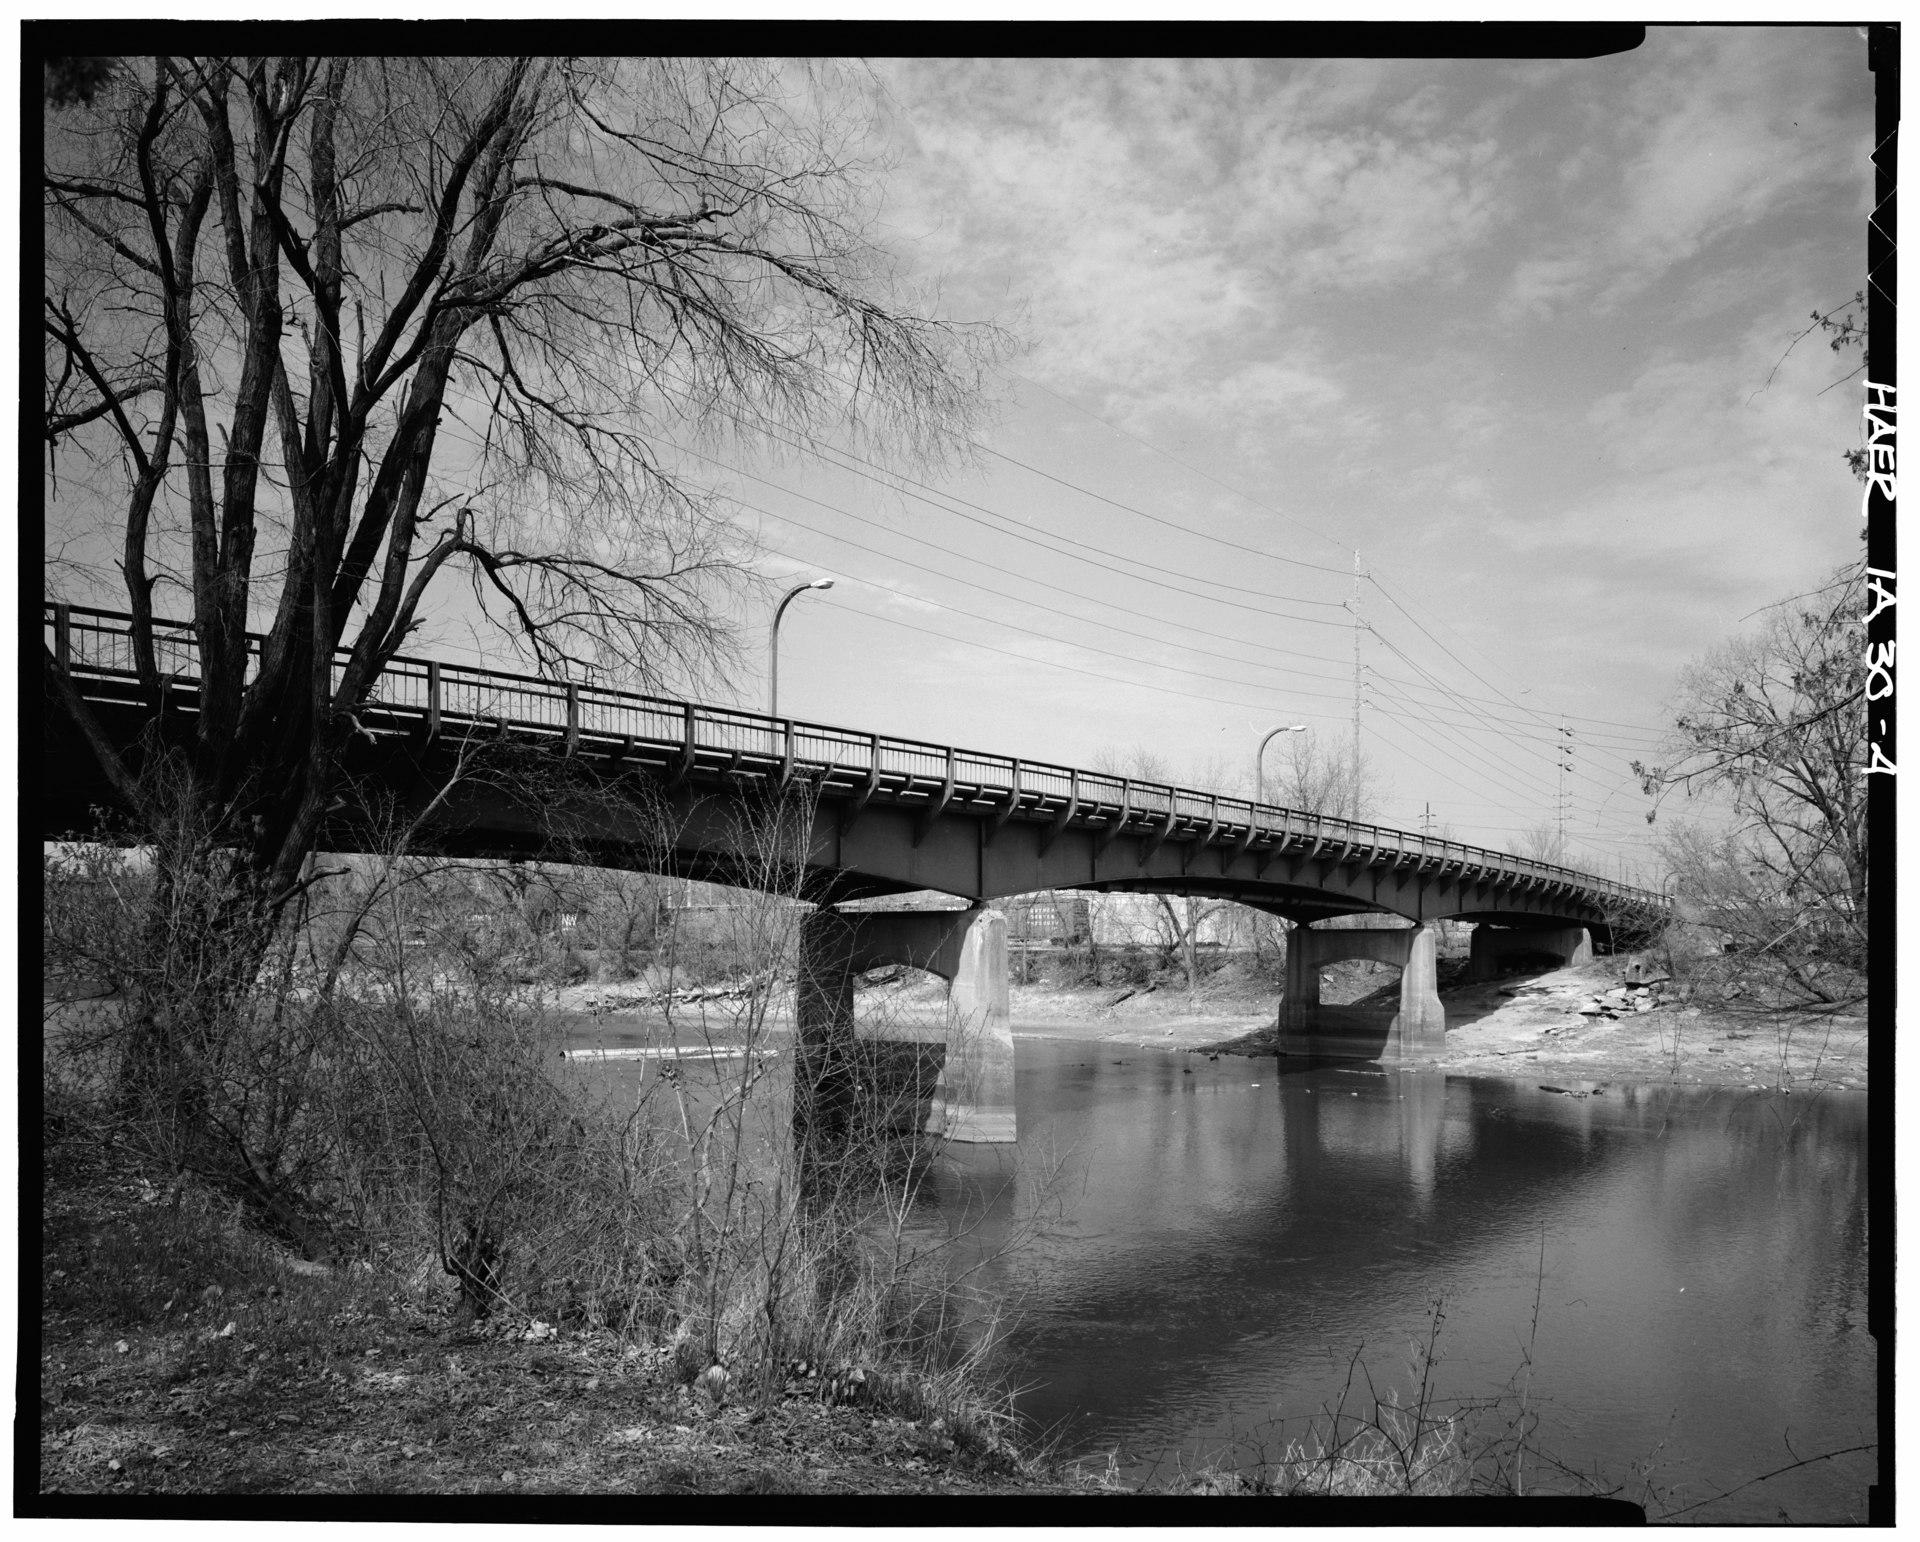 1949-BentonSt_BRIDGE_FROM_THE_WEST_BANK_OF_THE_IOWA_RIVER,_LOOKING_NORTHEAST_(Harms)_-_Benton_Street_Bridge,_Spanning_Iowa_River_at_Benton_Street,_Iowa_City,_Johnson_County,_IA_HAER_IOWA,52-IOWCI,4-4.tif